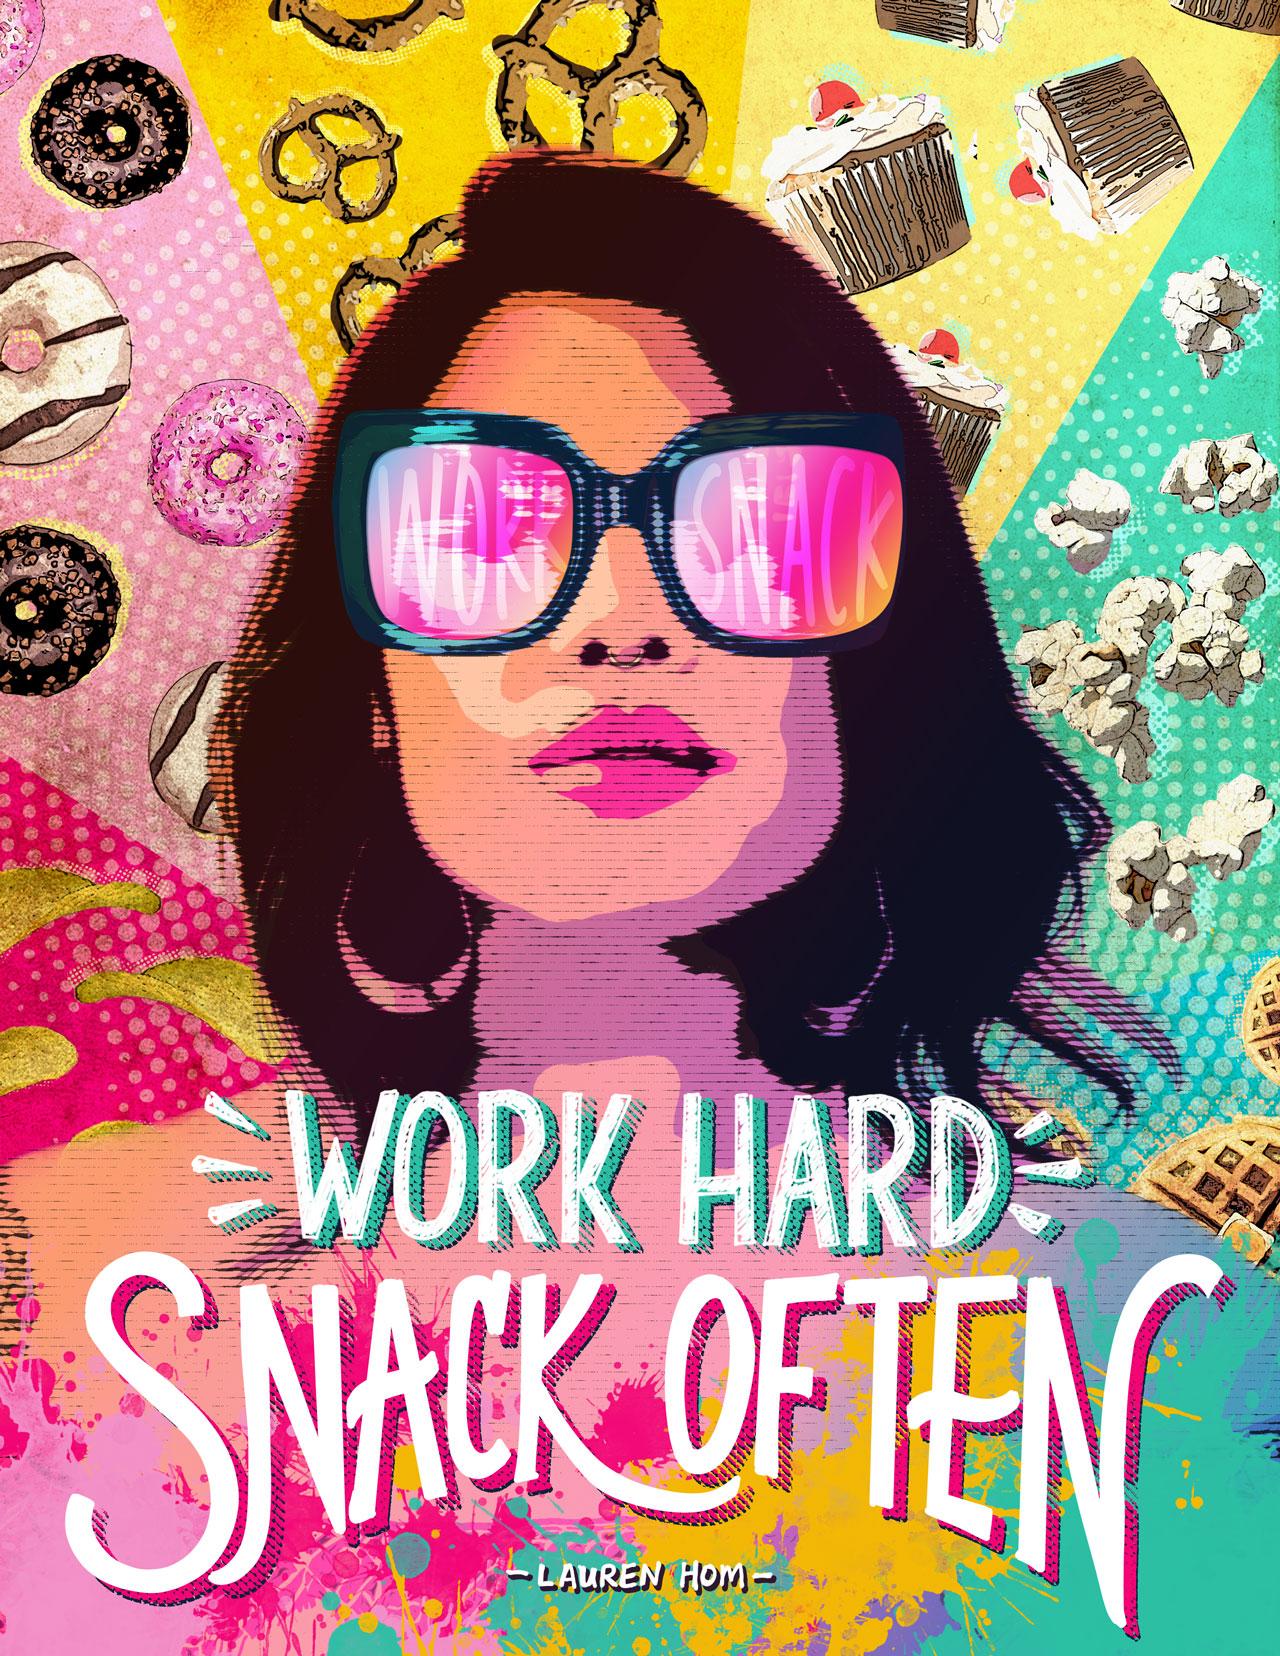 Lauren Hom inspired pop-art poster design